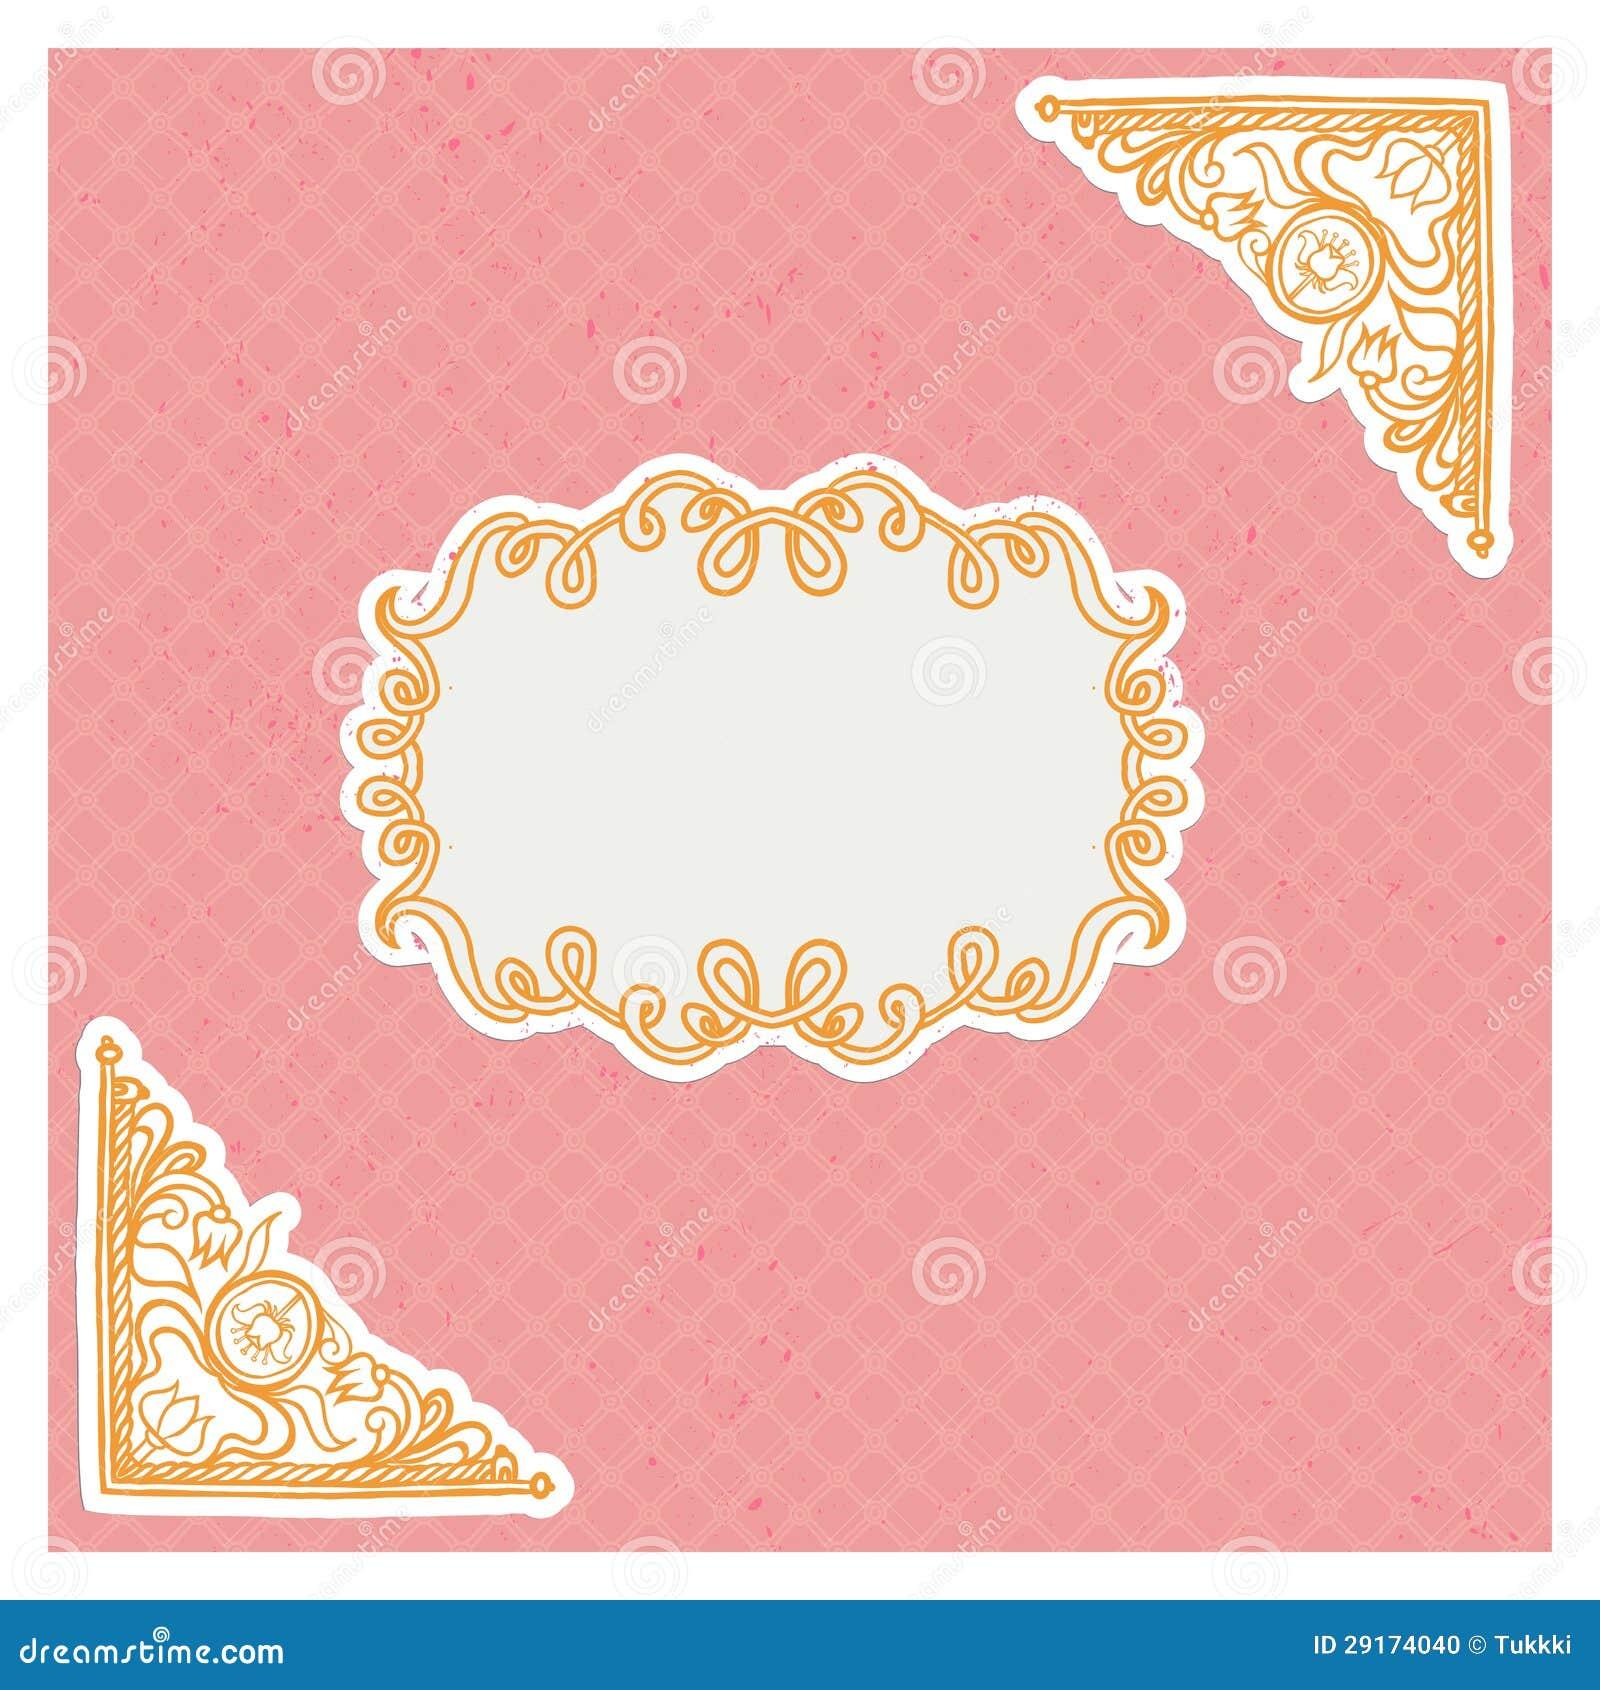 Blank Wedding Invitation with adorable invitations design